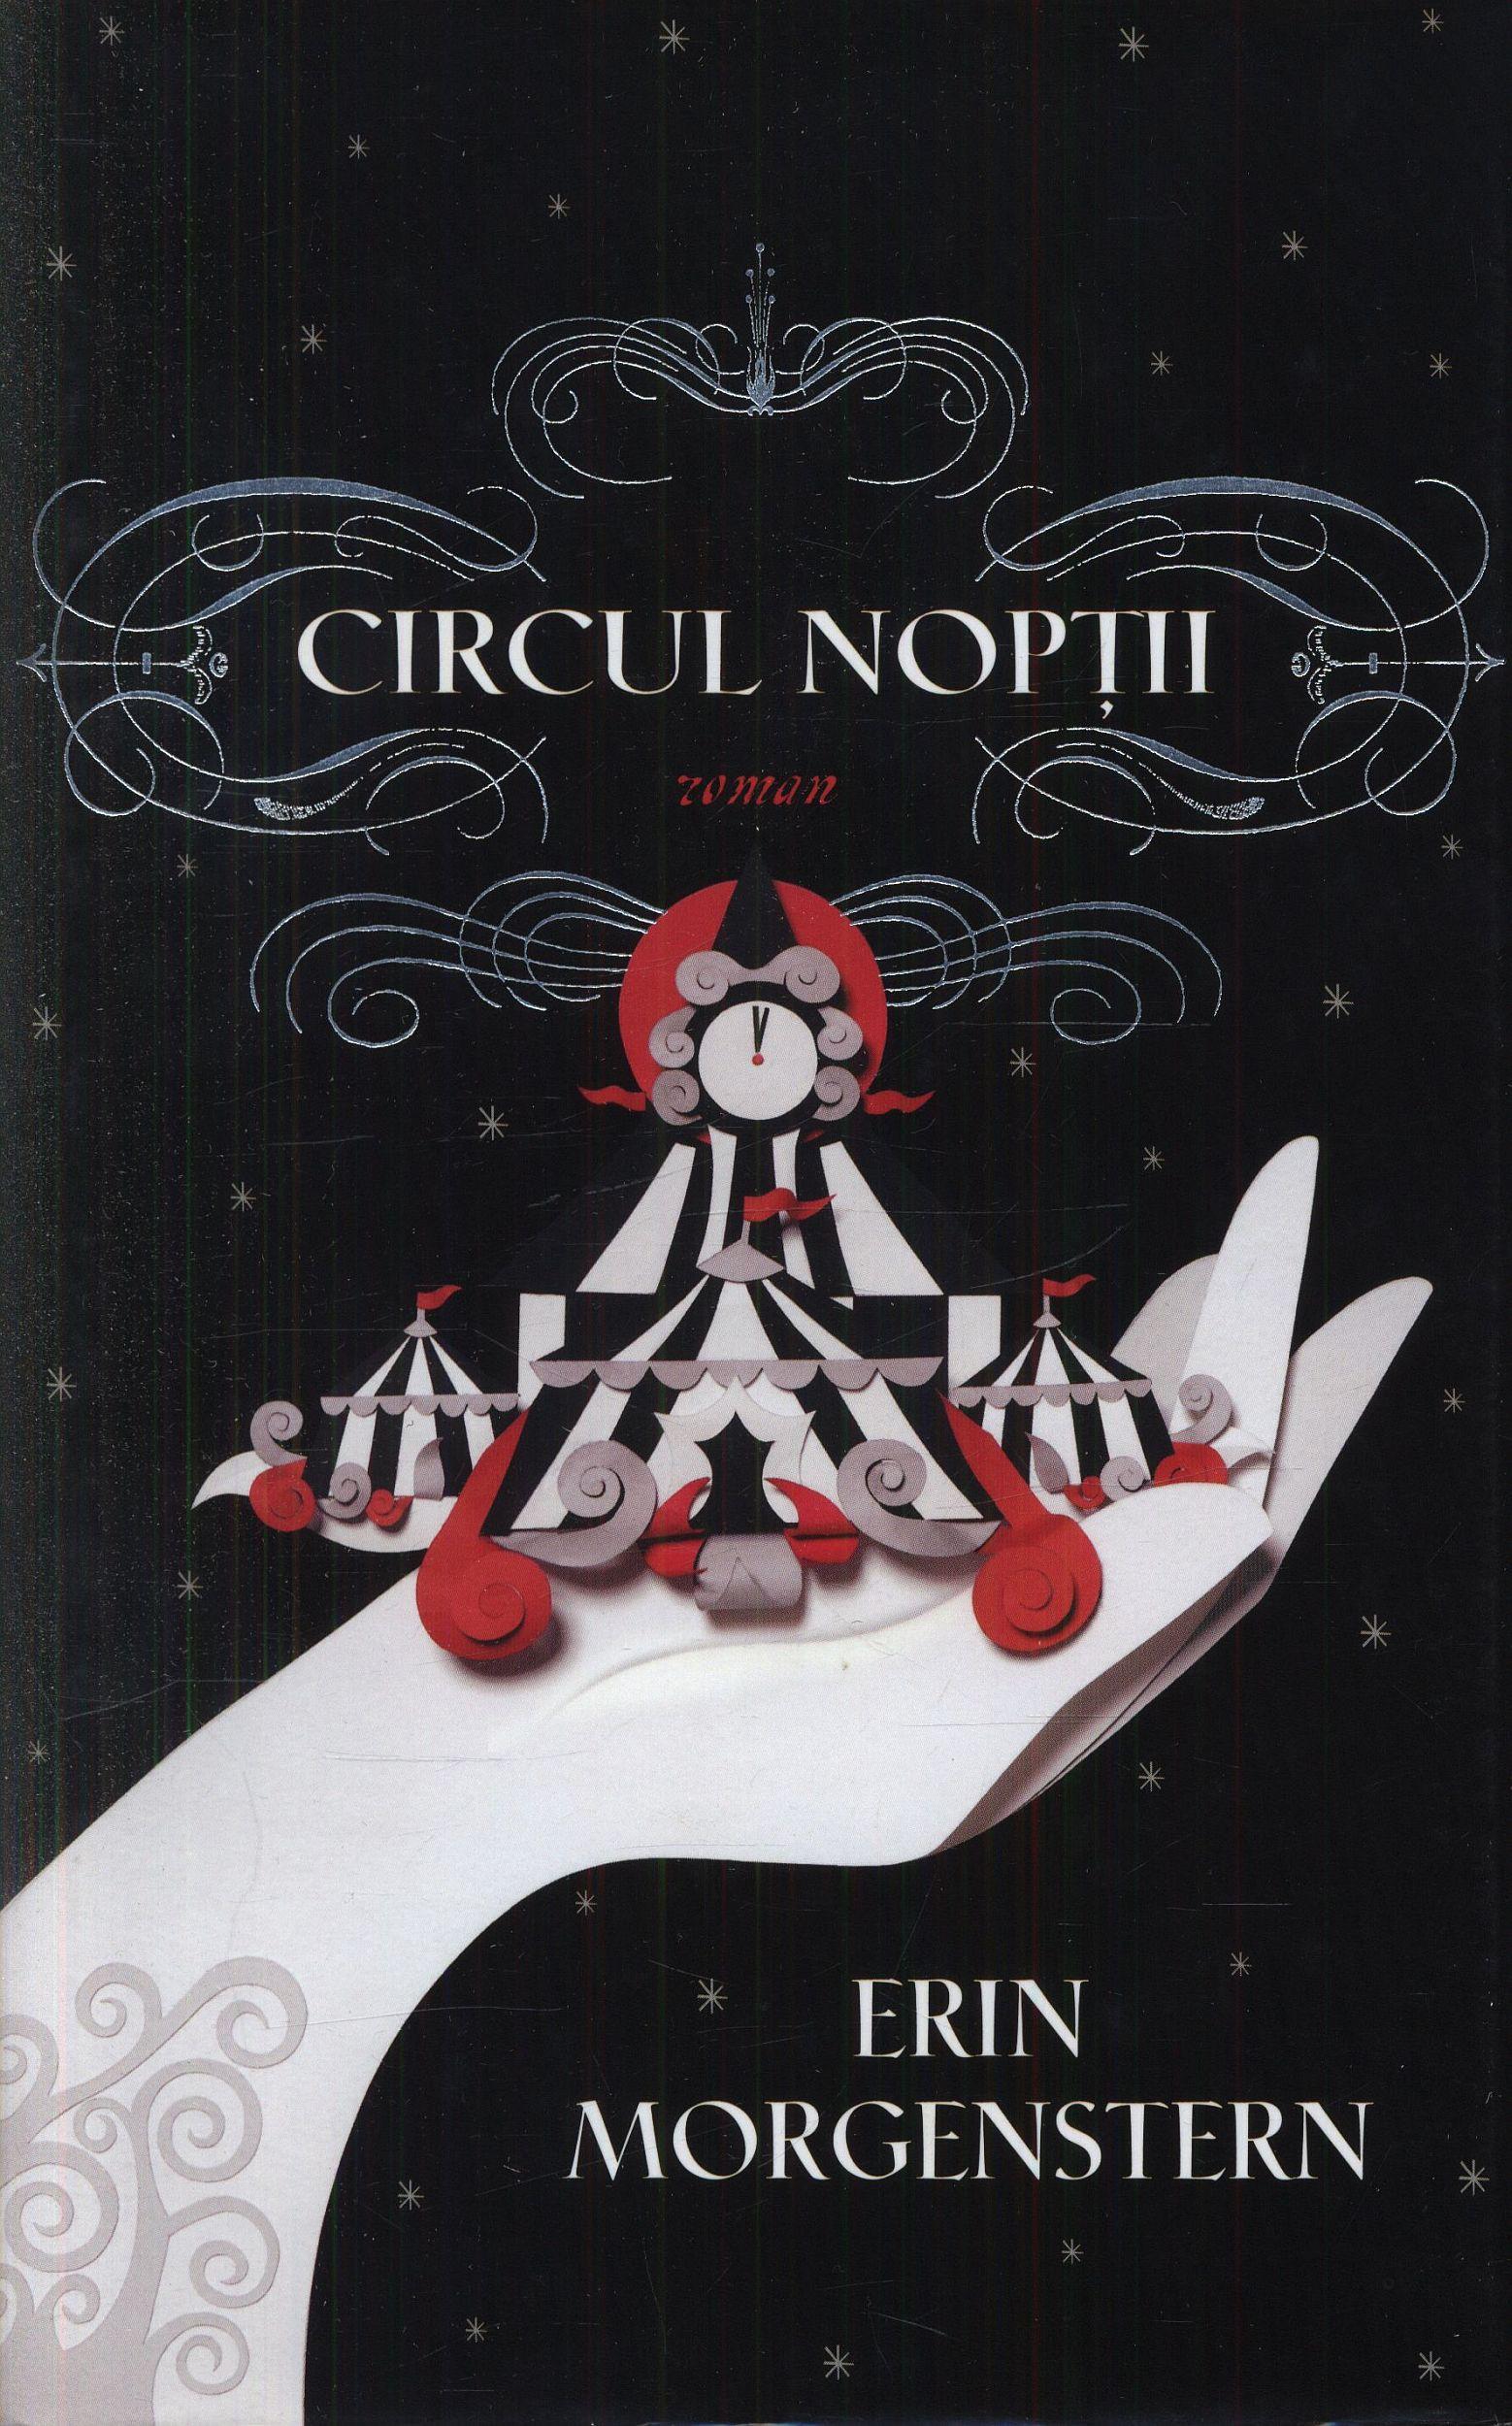 circul-noptii_1_fullsize